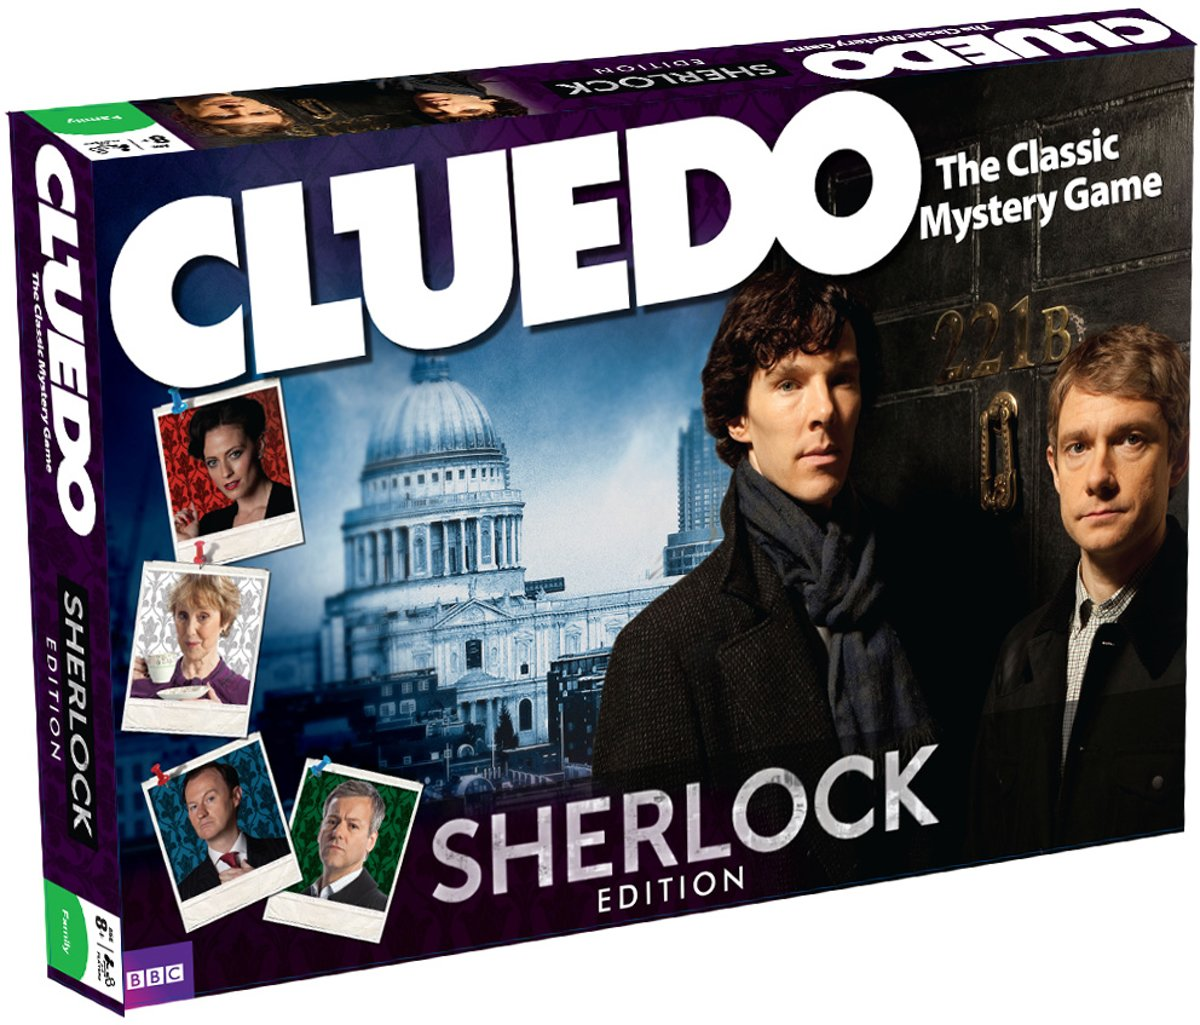 Cluedo Sherlock - Engelstalig Bordspel